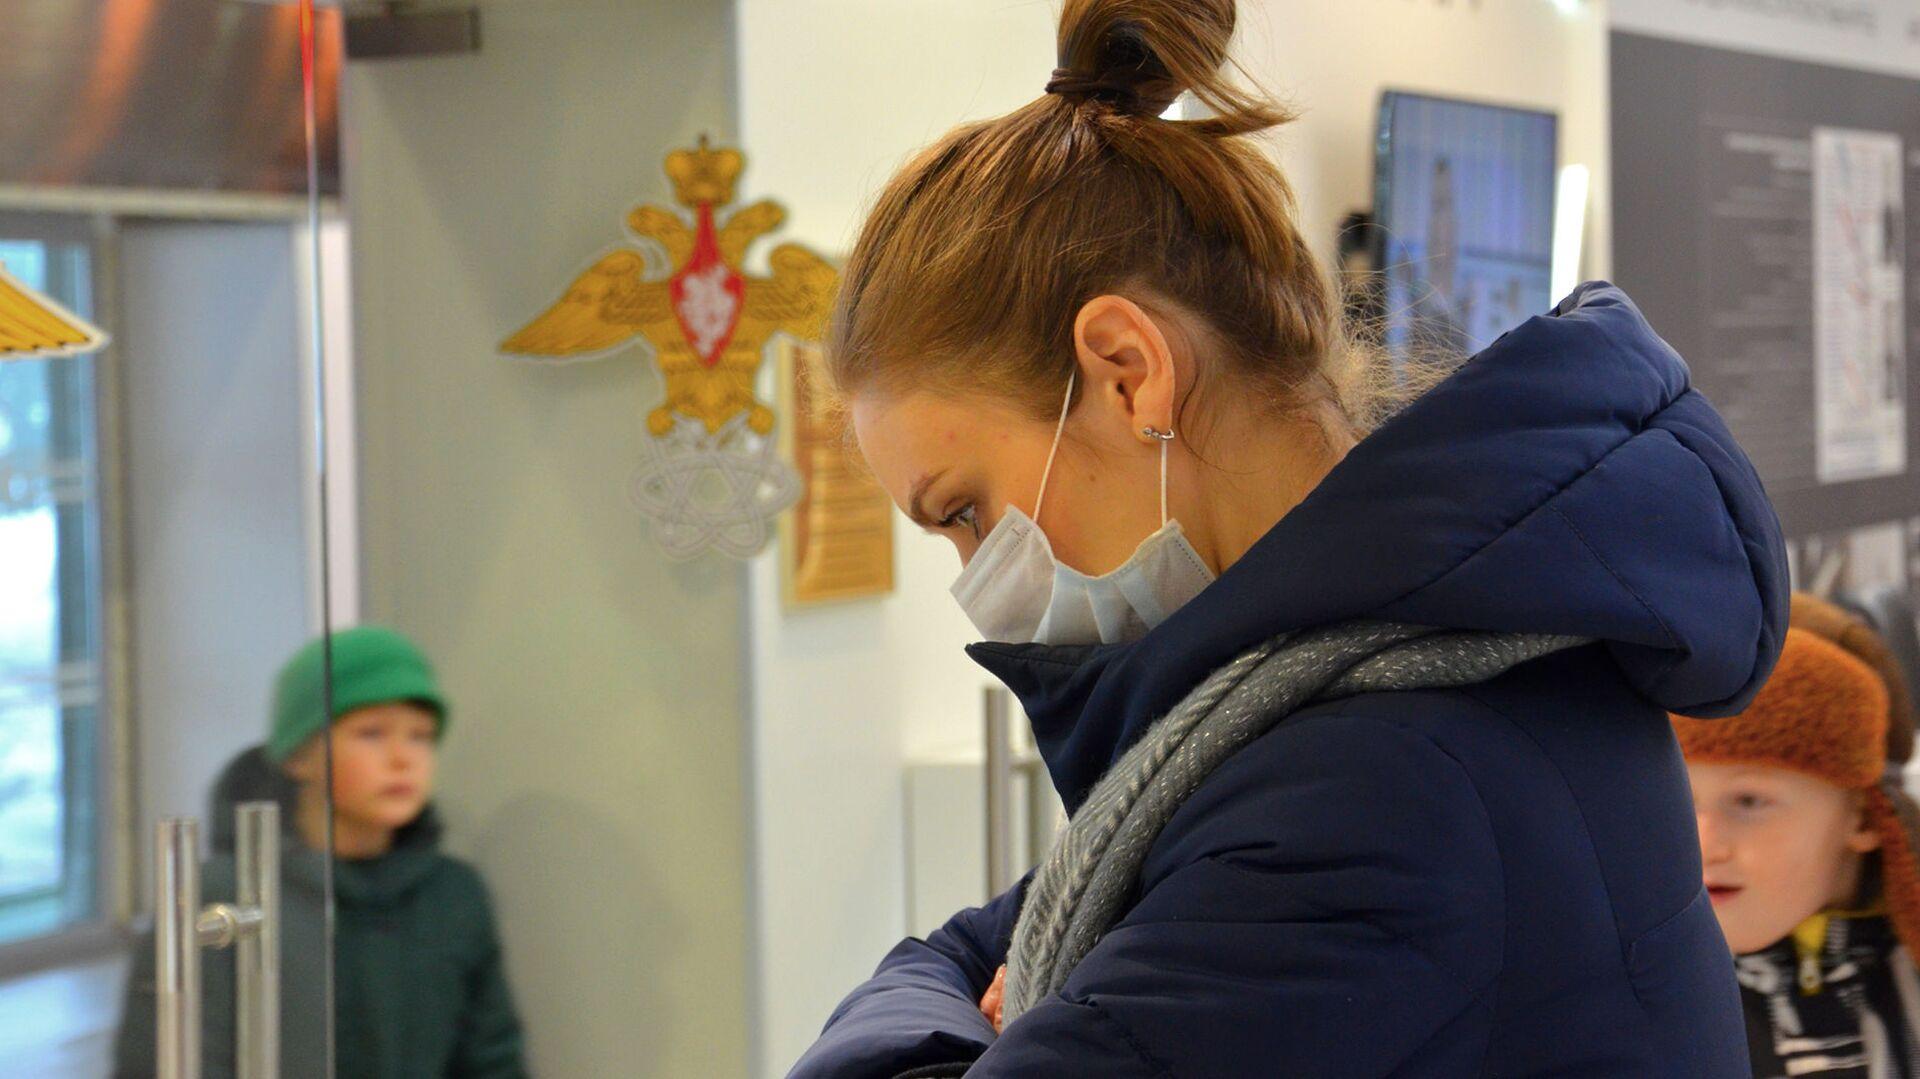 Coronavirus in Russia - Regione di Mosca, gennaio 2021 - Sputnik Italia, 1920, 13.06.2021